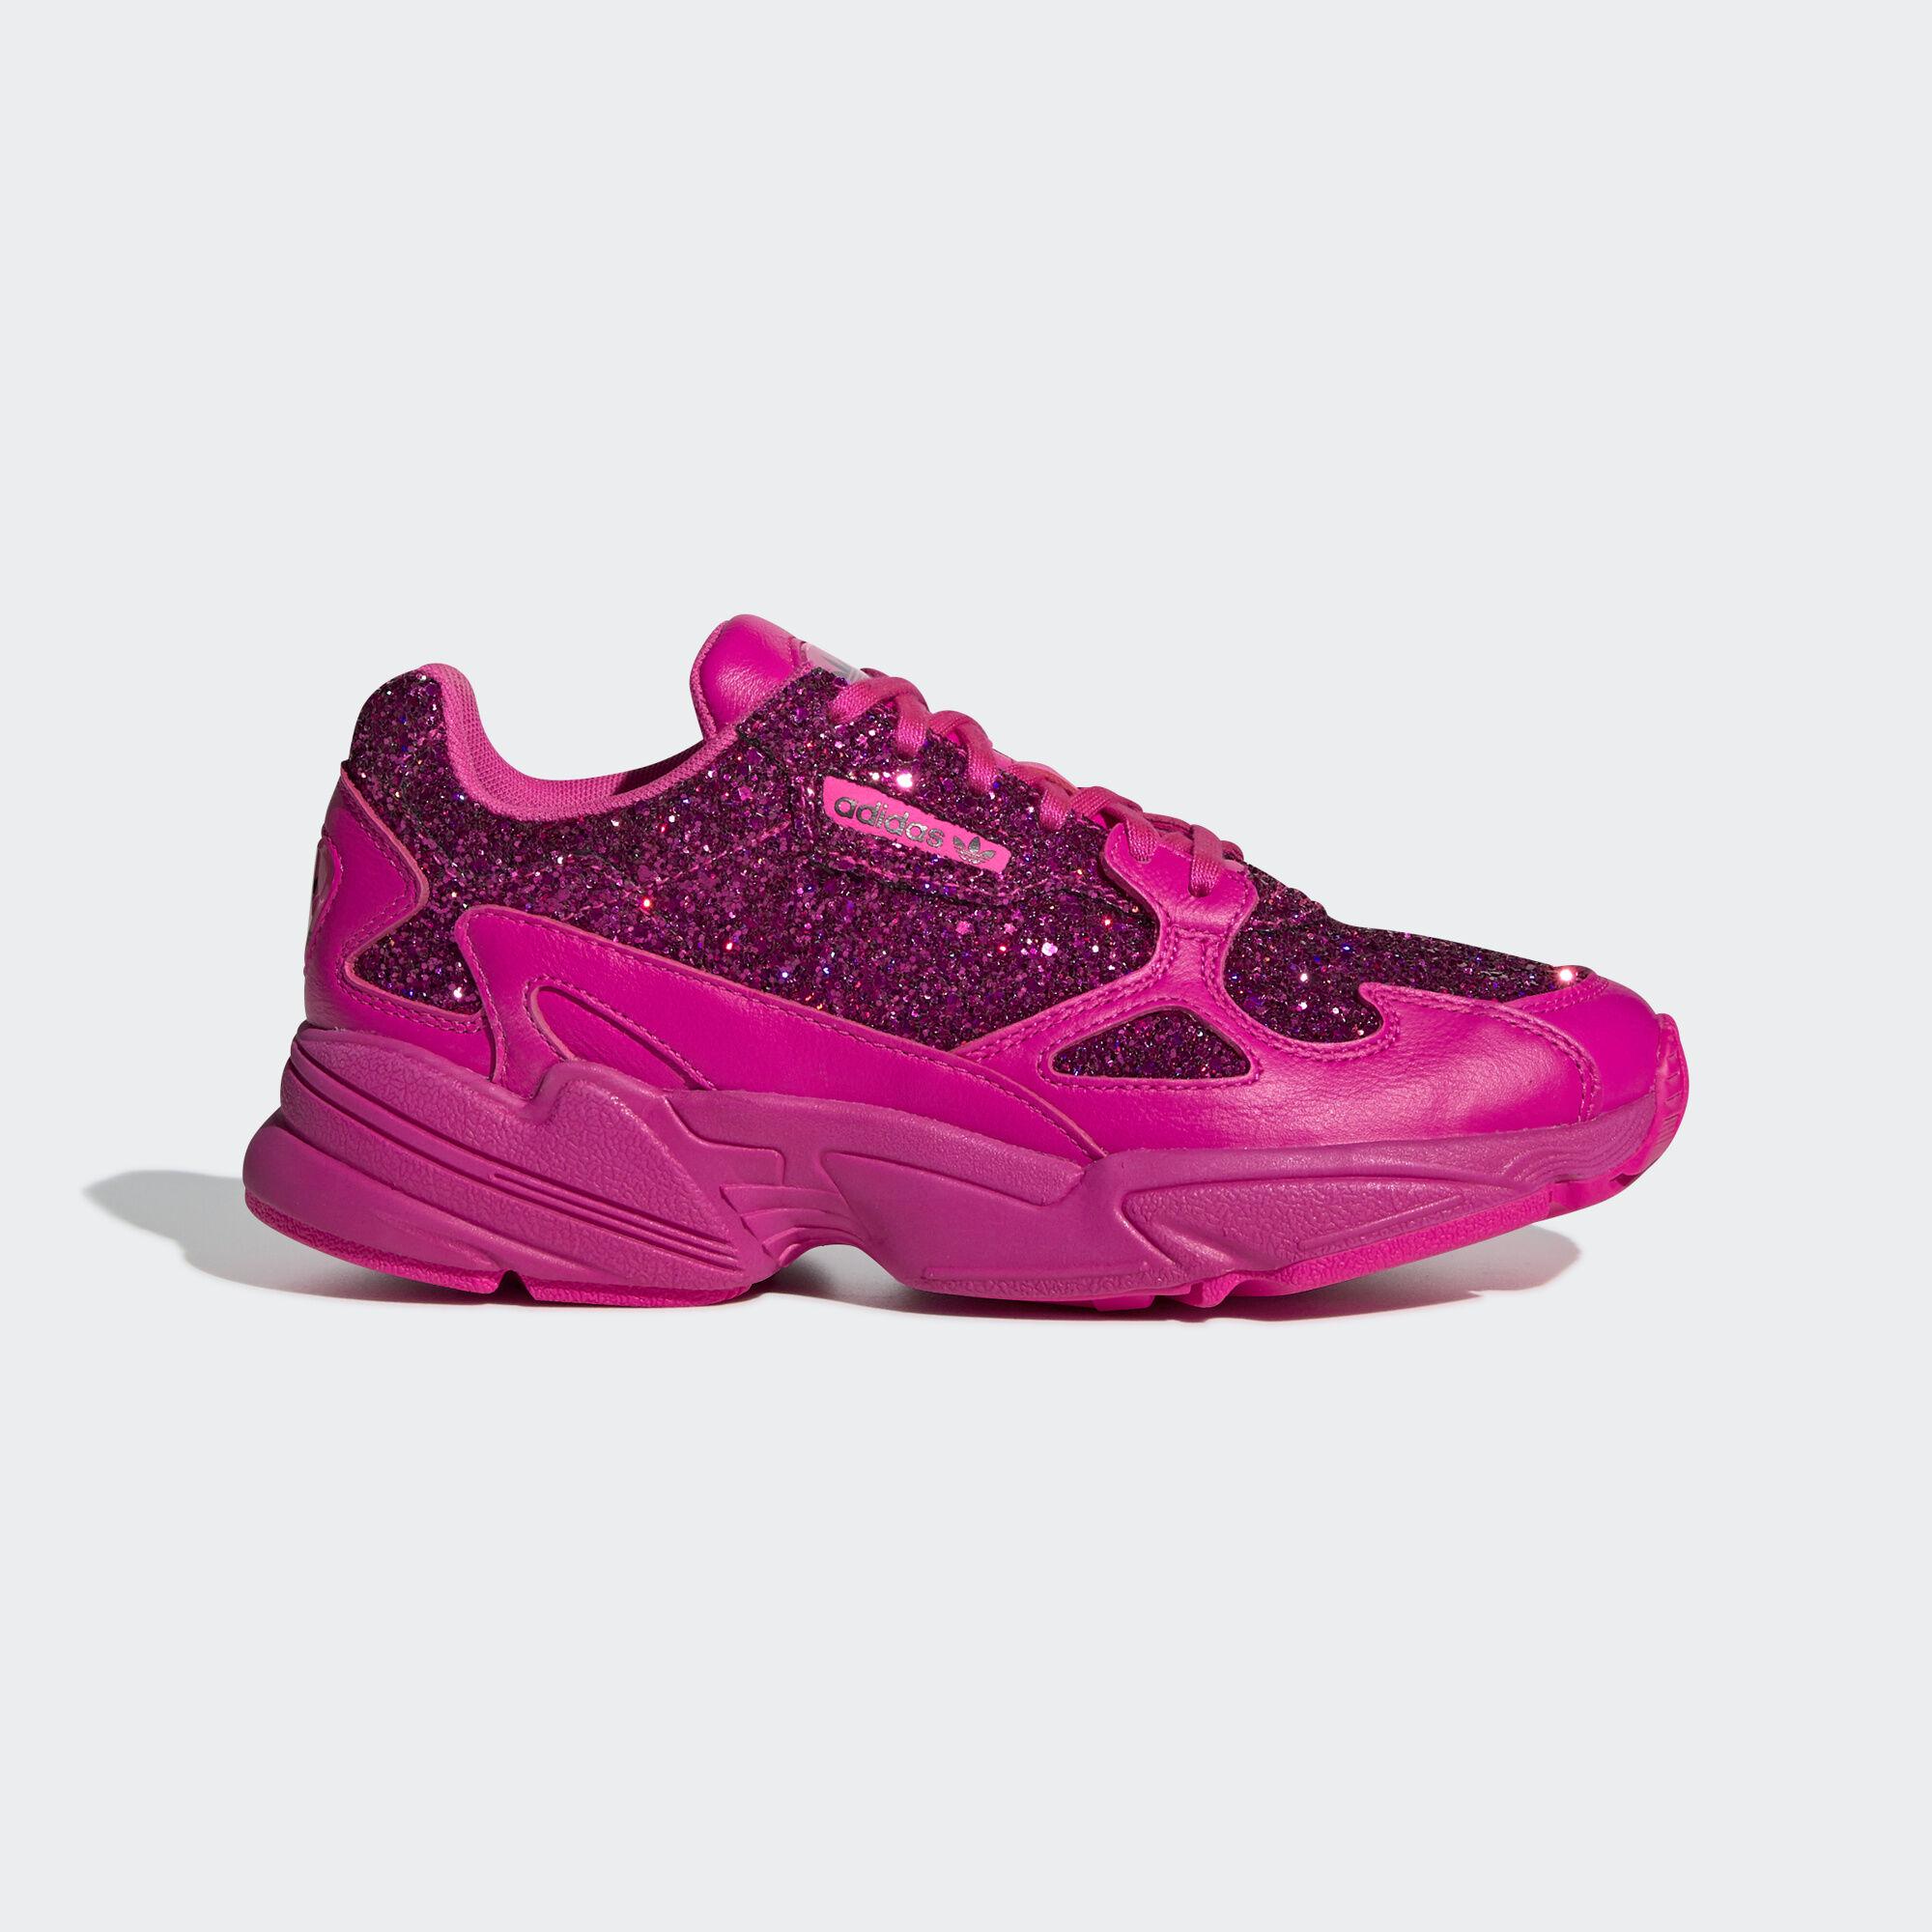 big sale 7b217 9e260 adidas - Falcon Shoes Shock Pink  Shock Pink  Collegiate Purple BD8077.  Women Originals